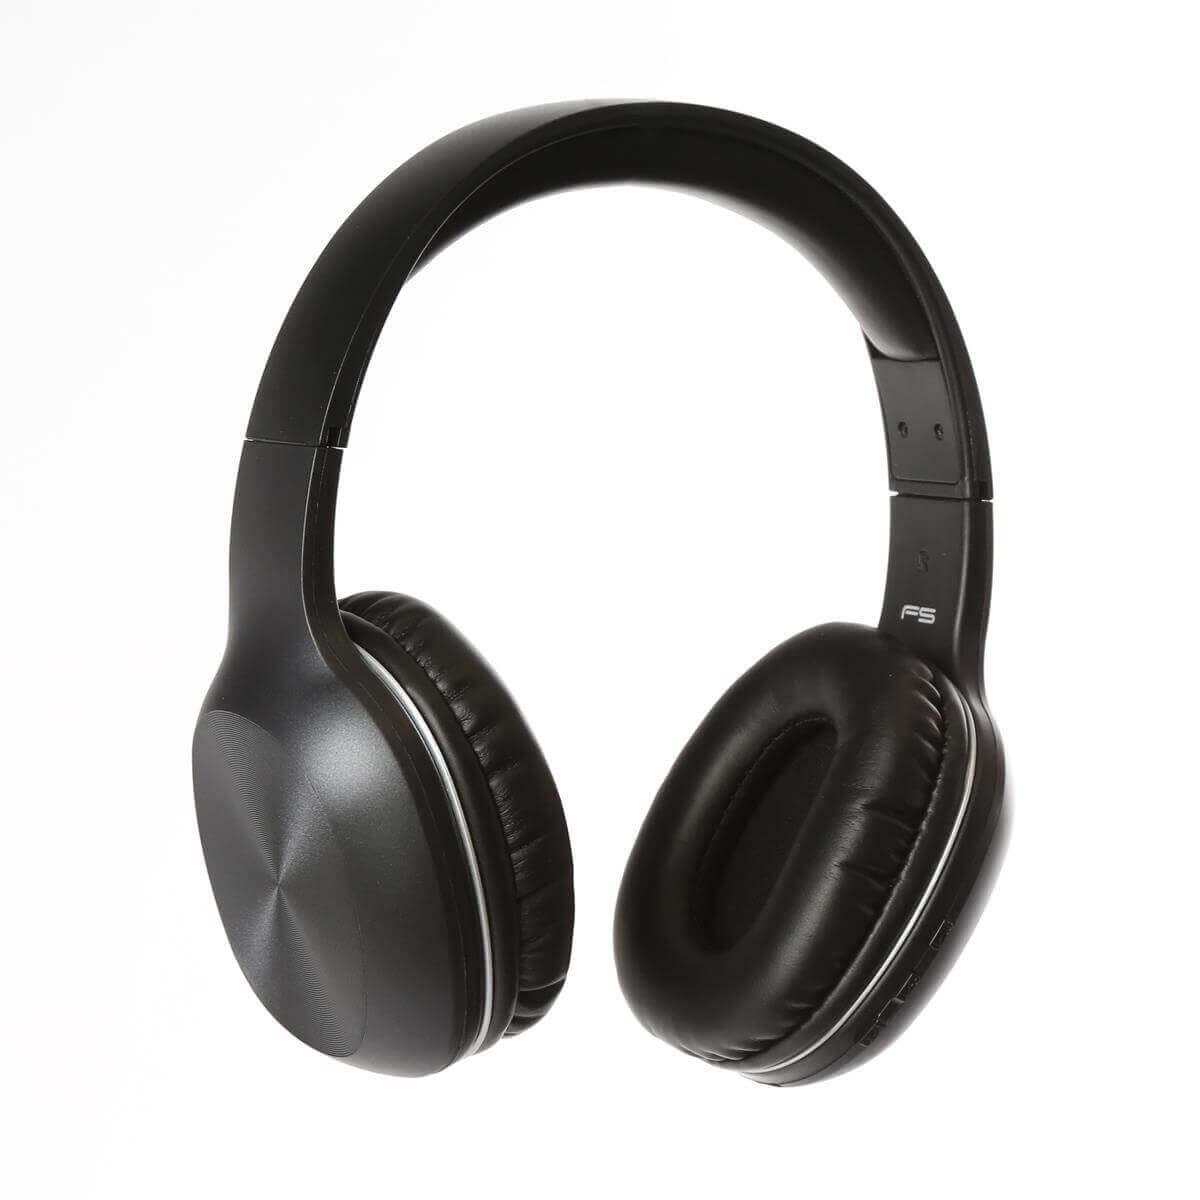 Platinet Freestyle Headset Bluetooth FH0918 — безжични блутут слушалки за мобилни устройства (черен) - 1